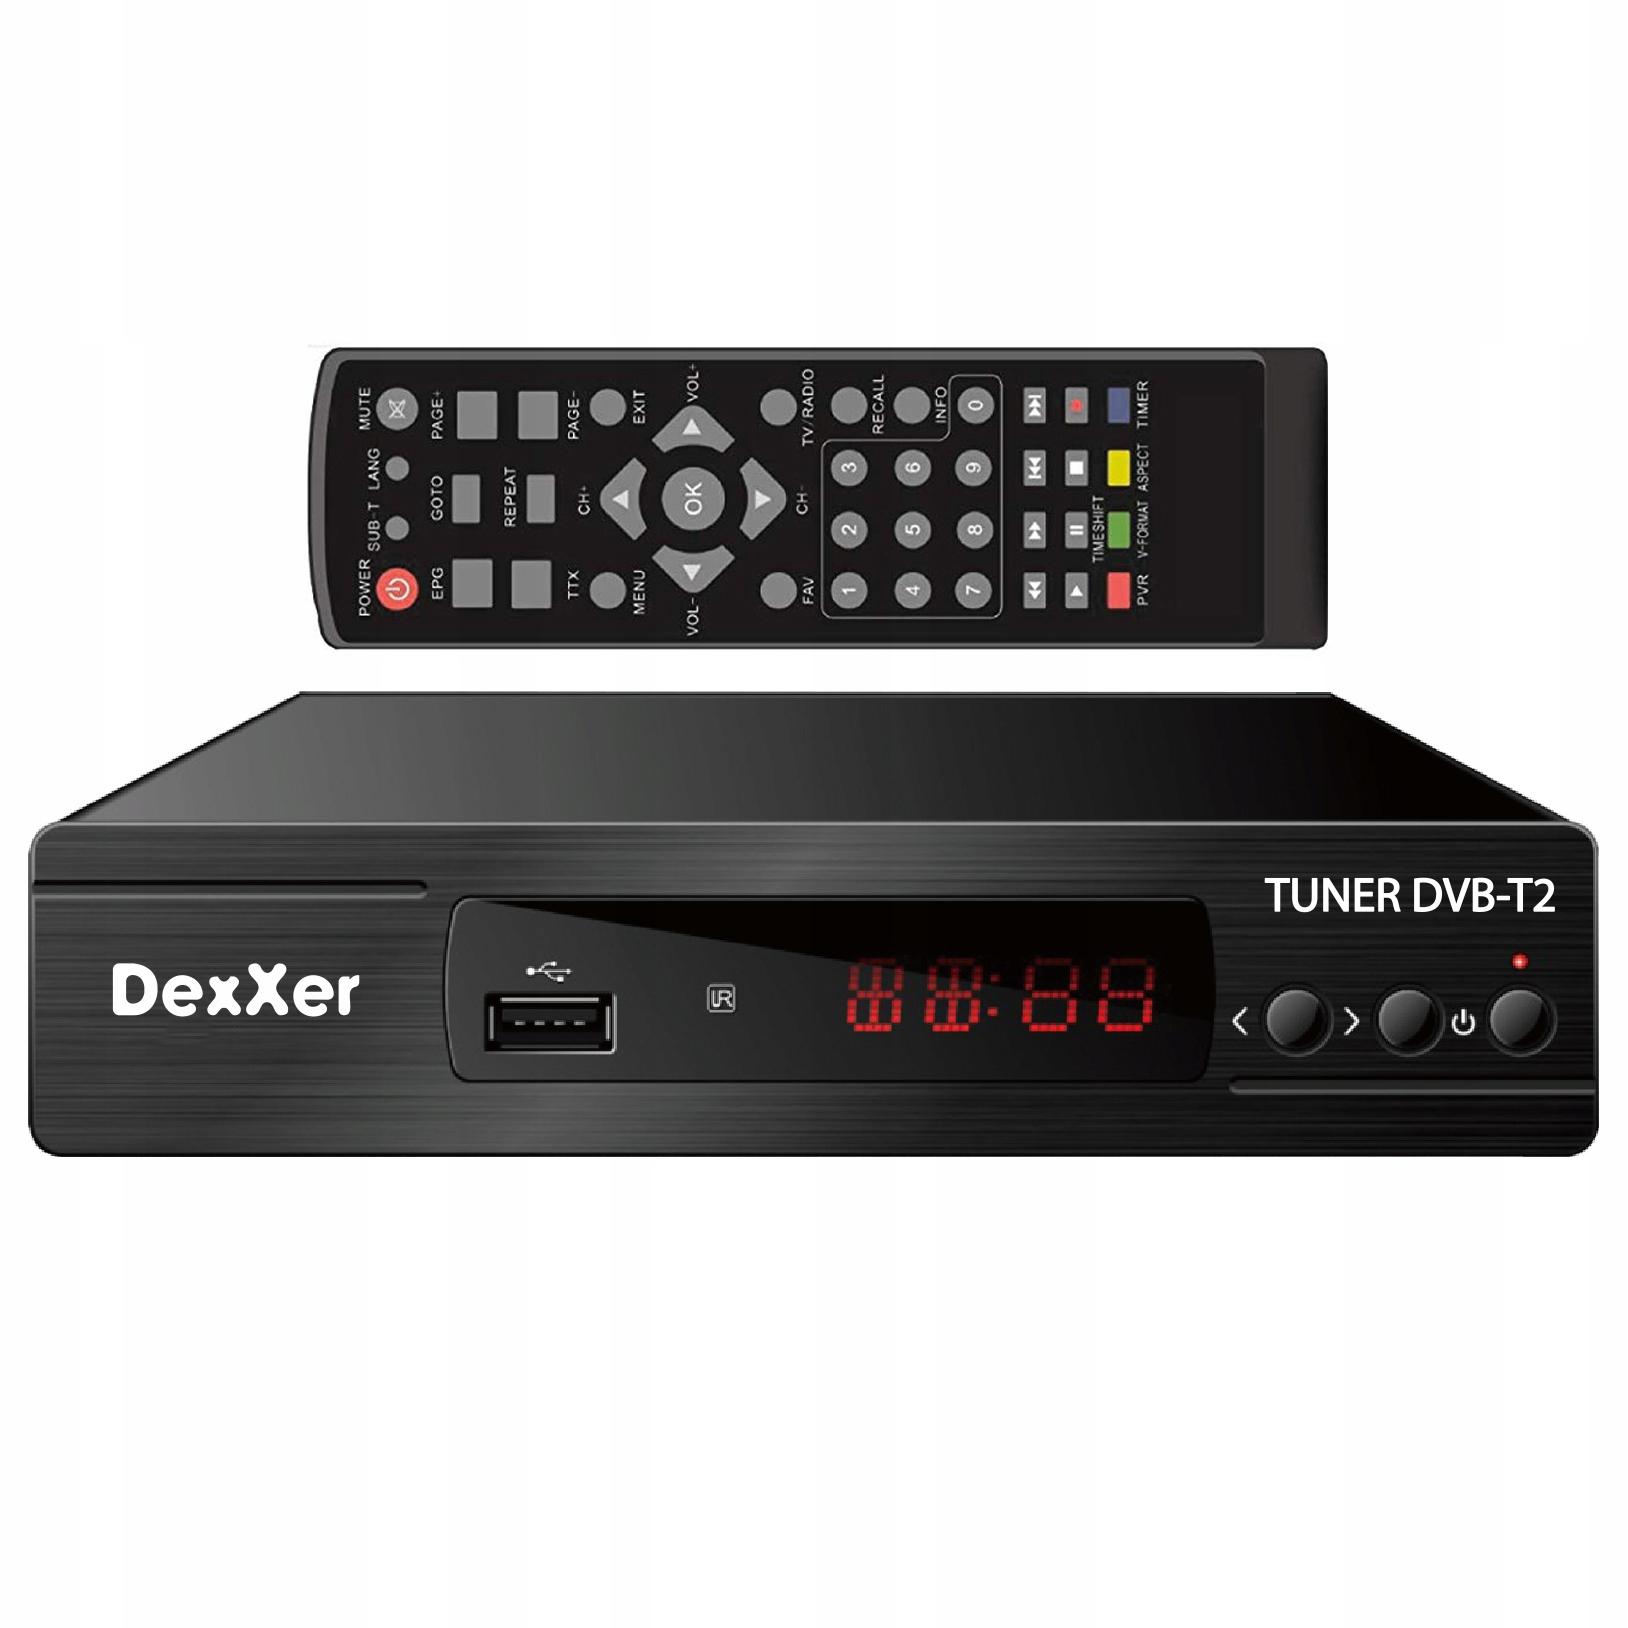 ТЮНЕР ЦИФРОВОЙ ДЕКОДЕР DVB-T DVB-T2 HDMI HD TV